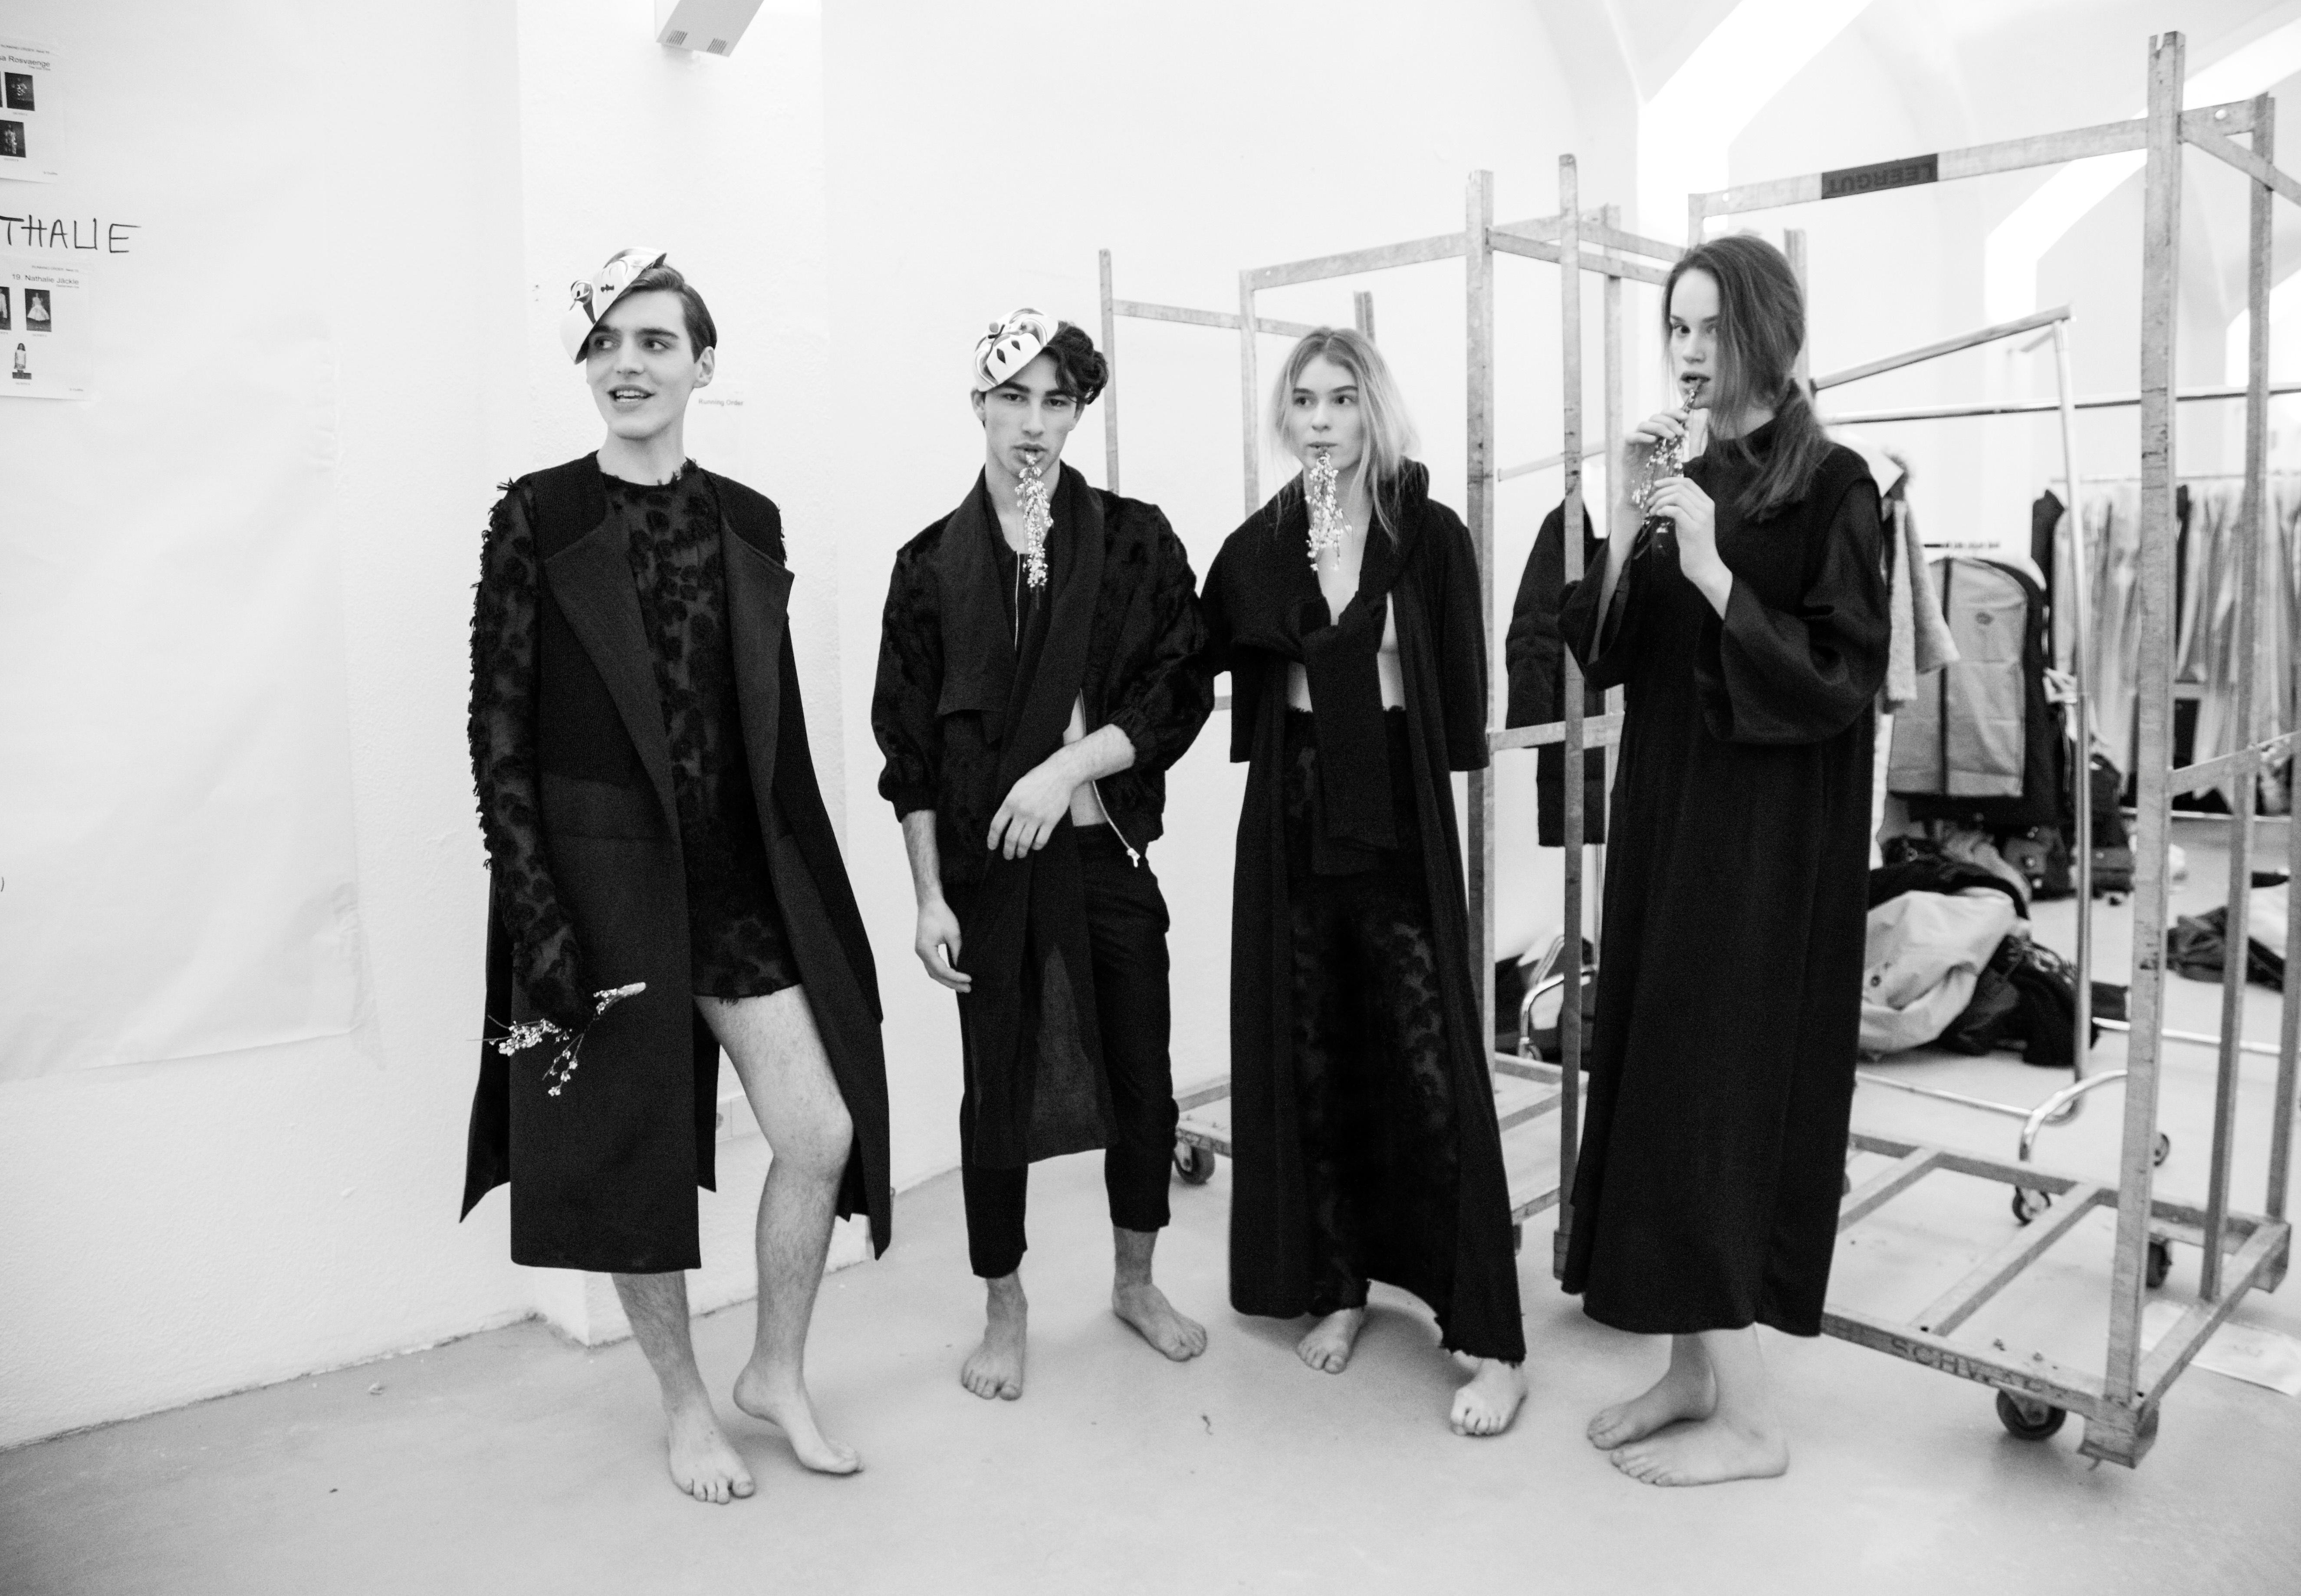 alice_m_huynh_graduate_fashion_show_24